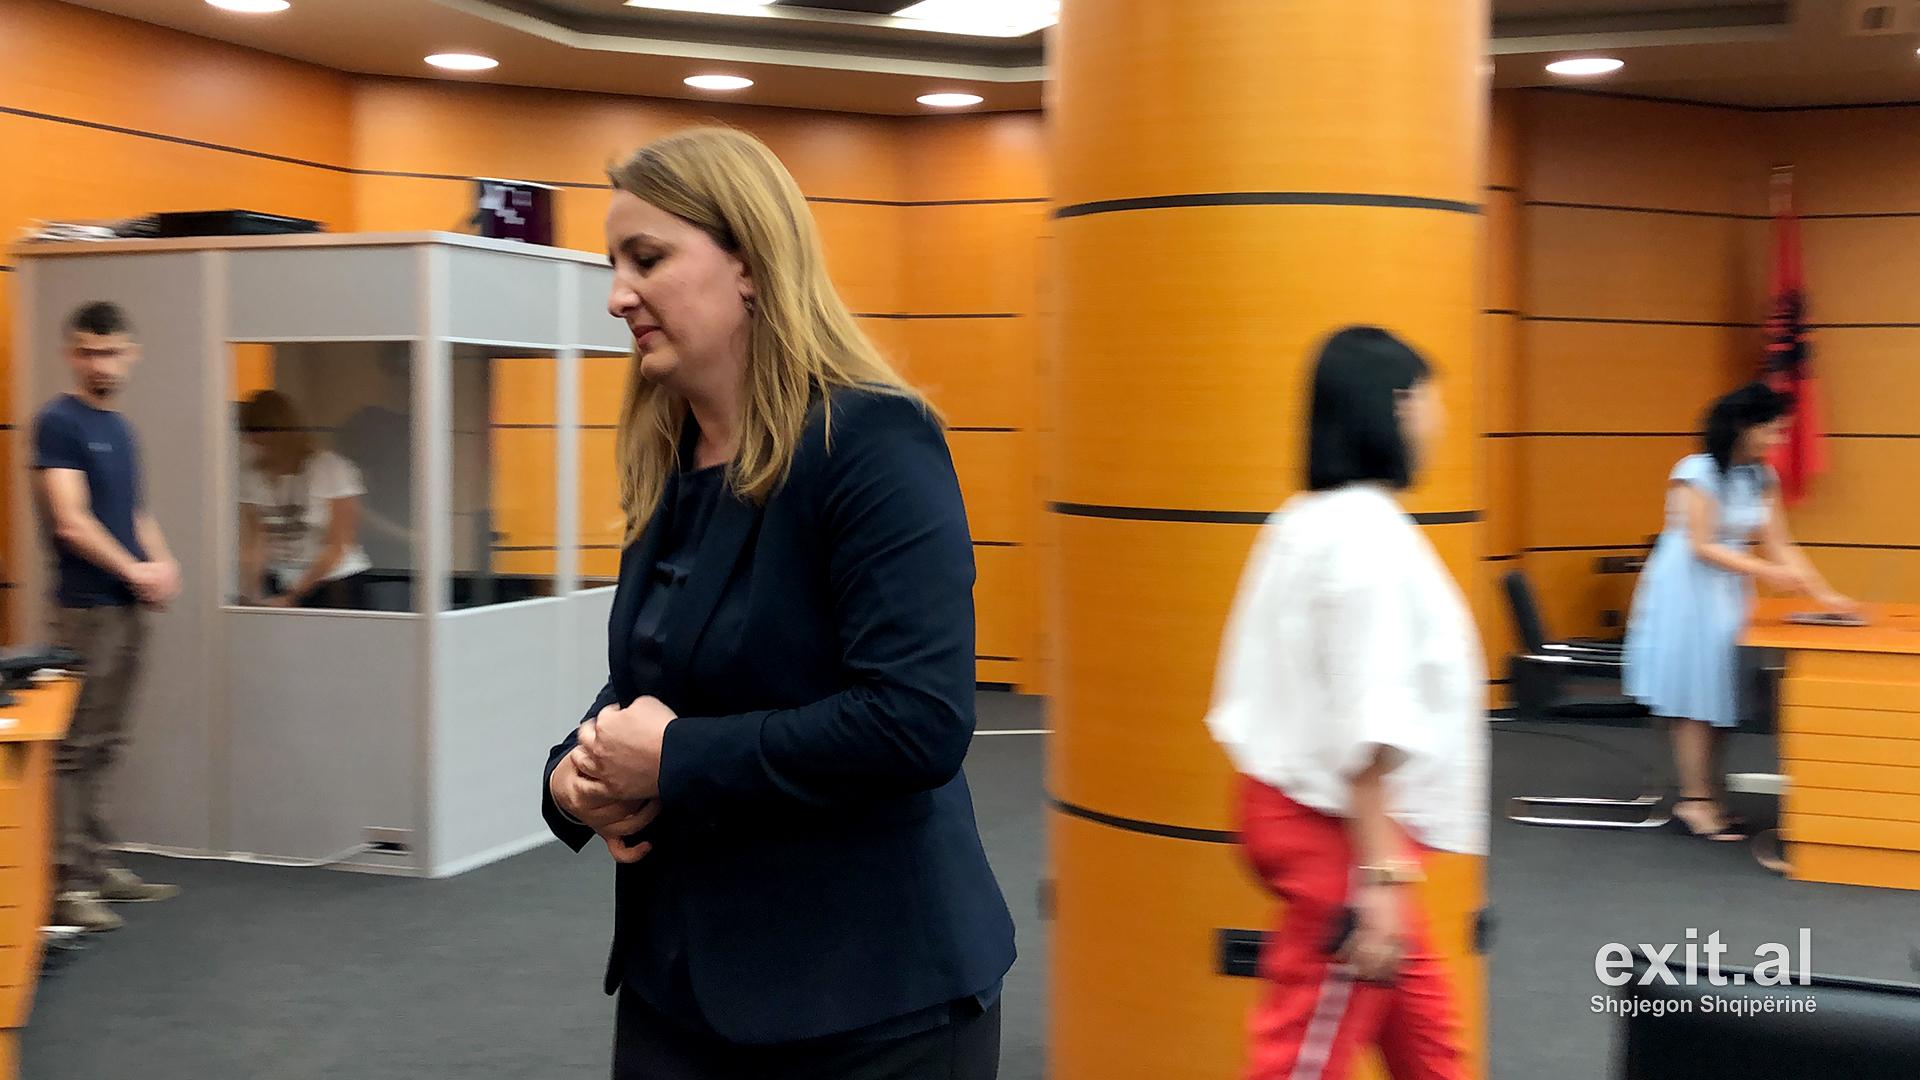 Prokurorja Esmeralda Cami zgjidhet anëtare e KLP